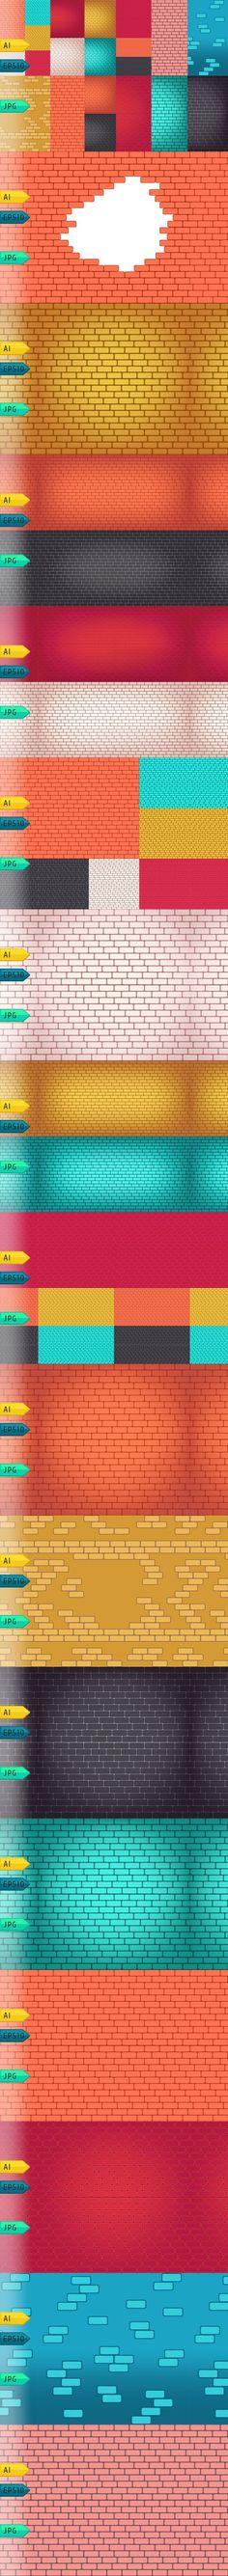 Brick walls seamless vector backdrop. Textures. $6.00